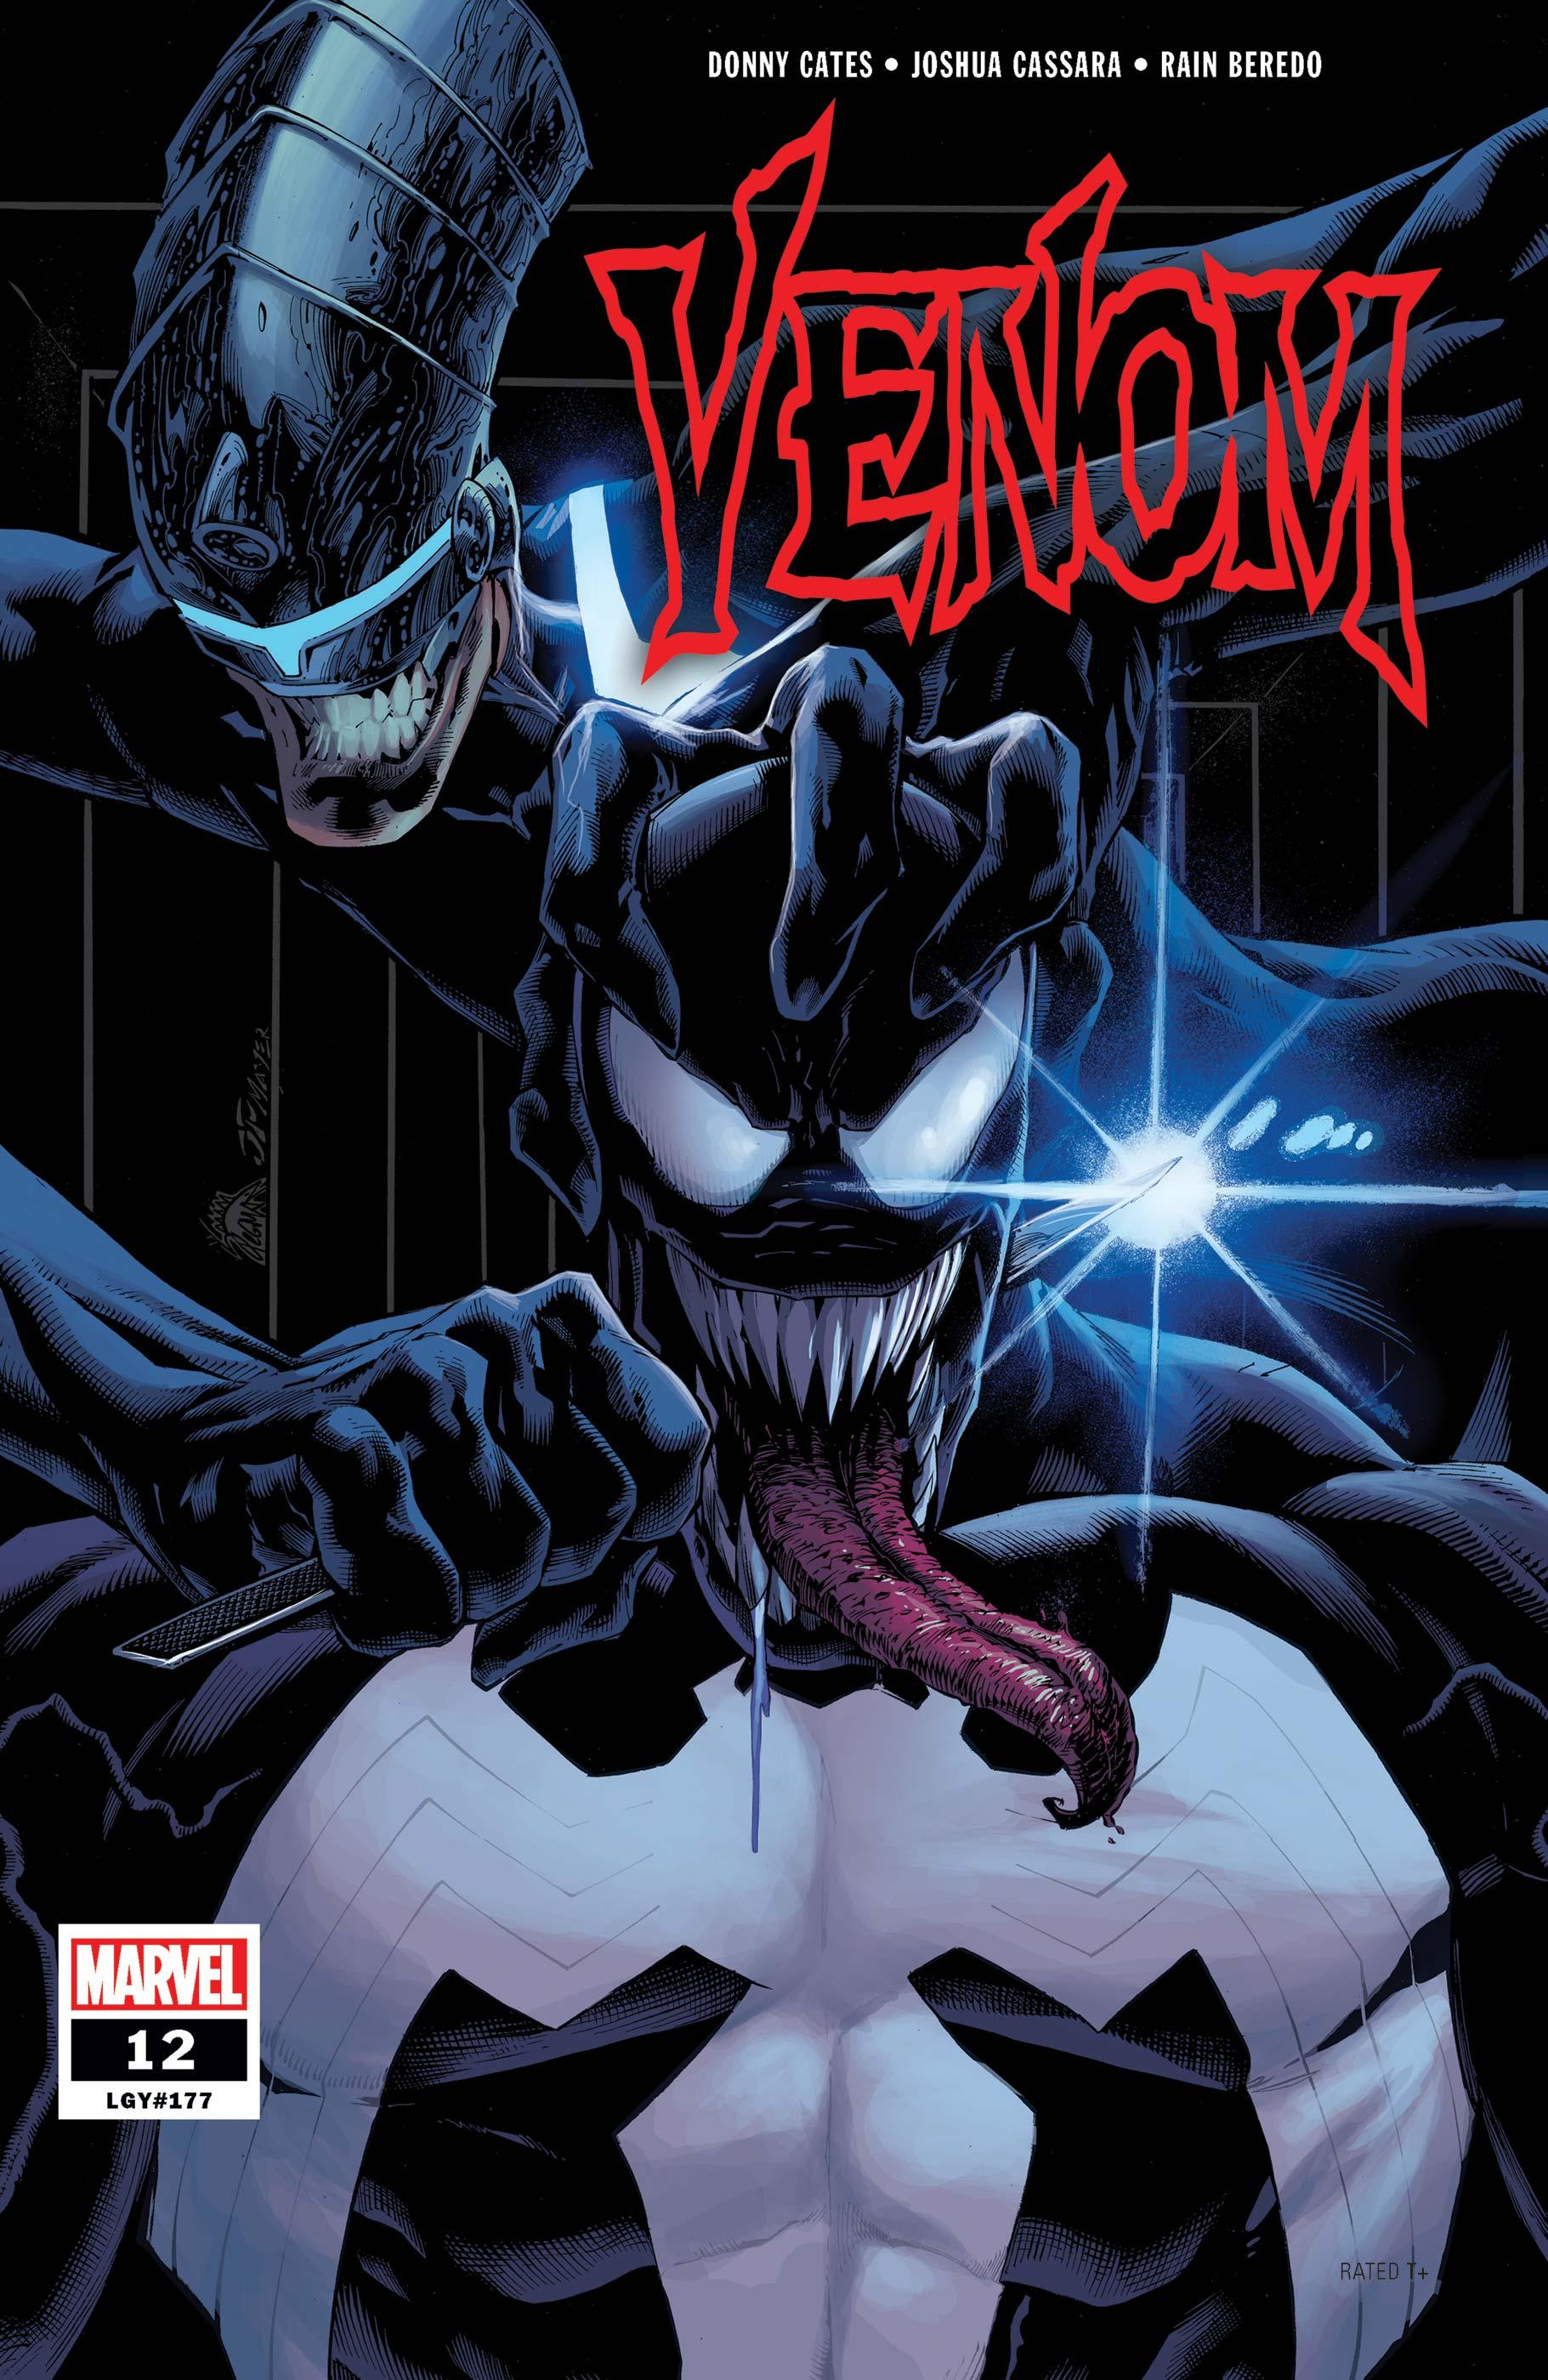 Venom (2018) #12